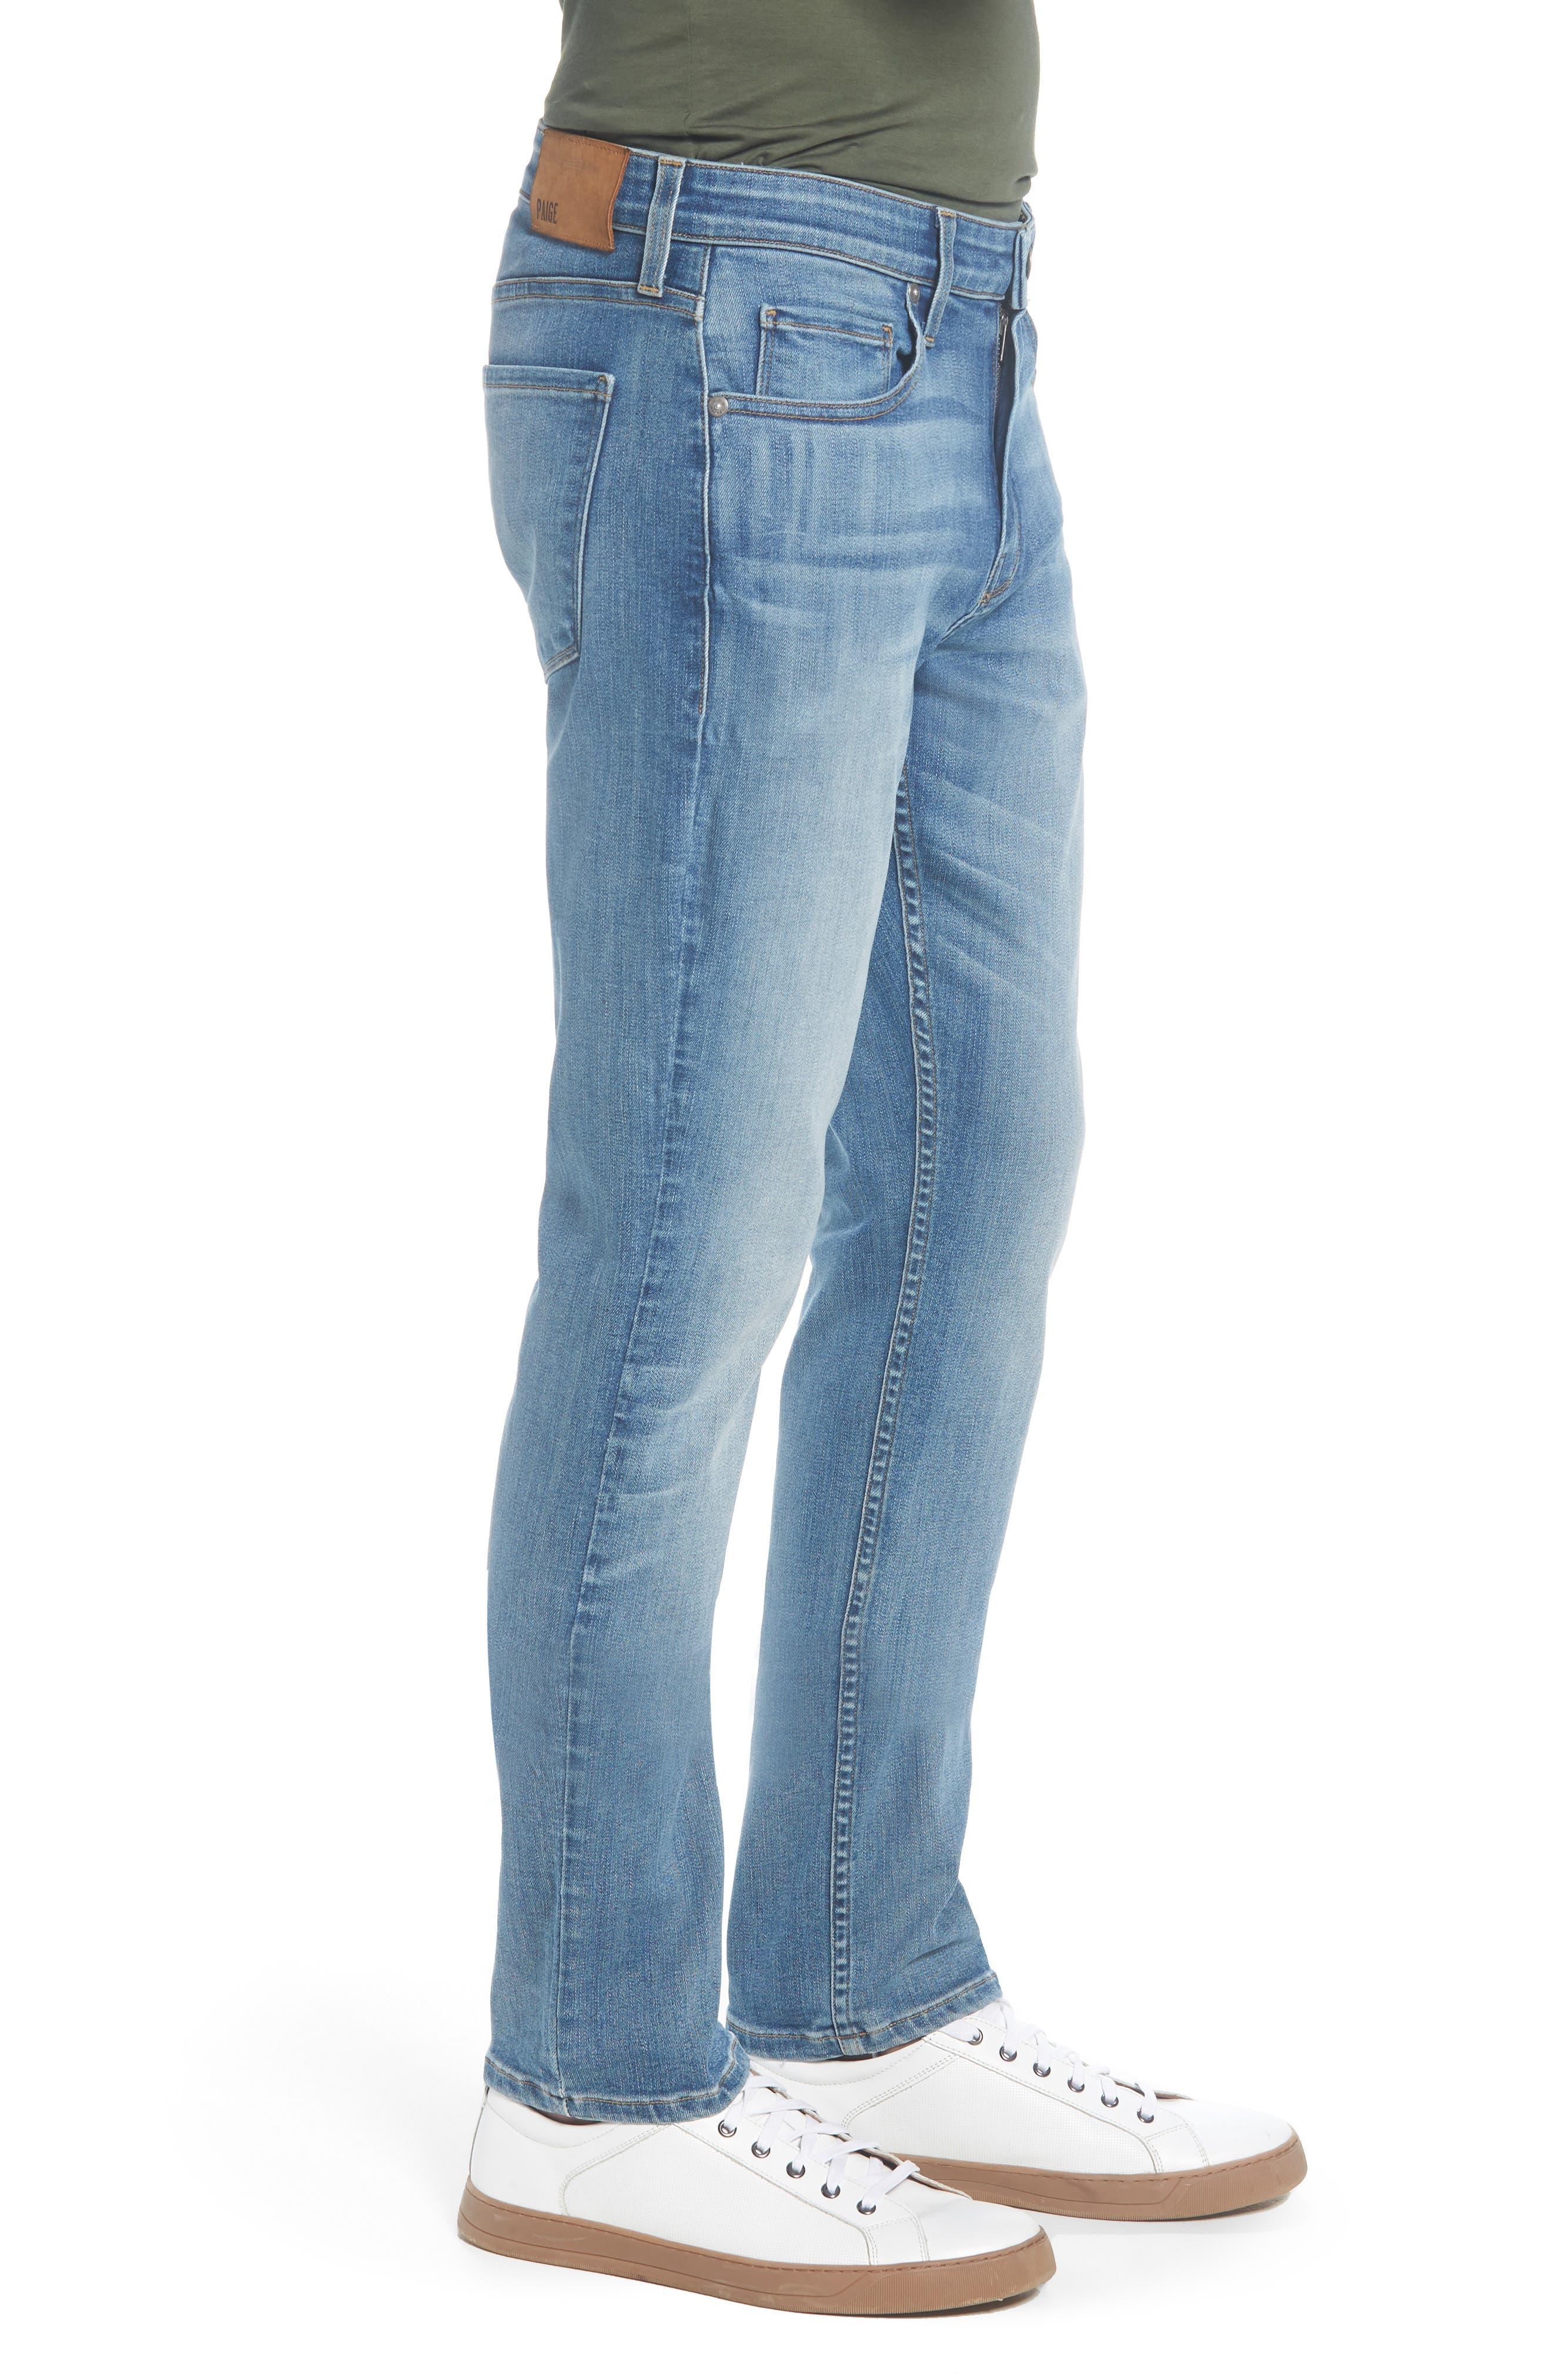 Transcend - Lennox Slim Fit Jeans,                             Alternate thumbnail 3, color,                             CARTWRIGHT